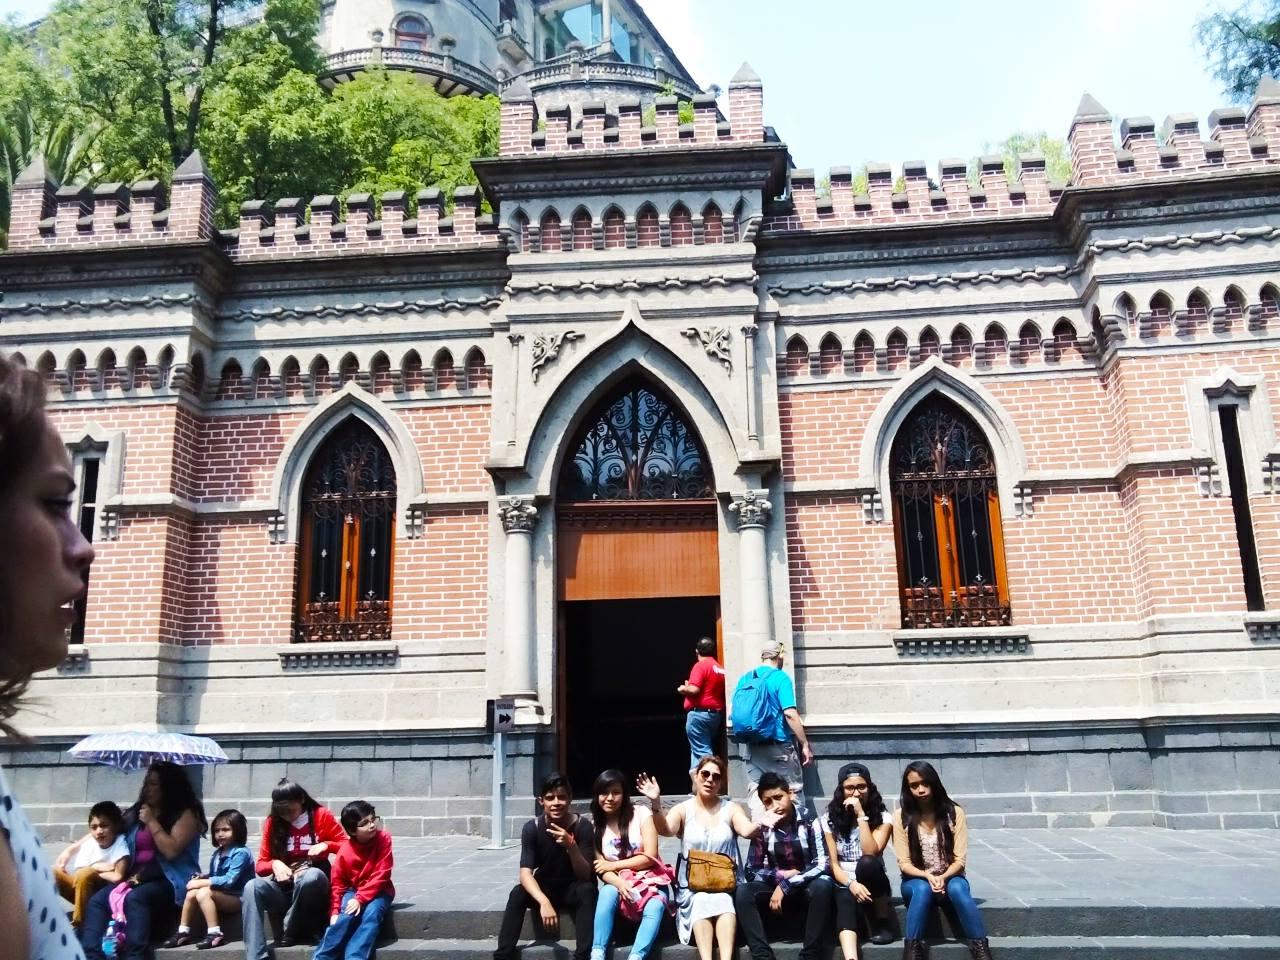 Visita al Castillo de Chapultepec 1